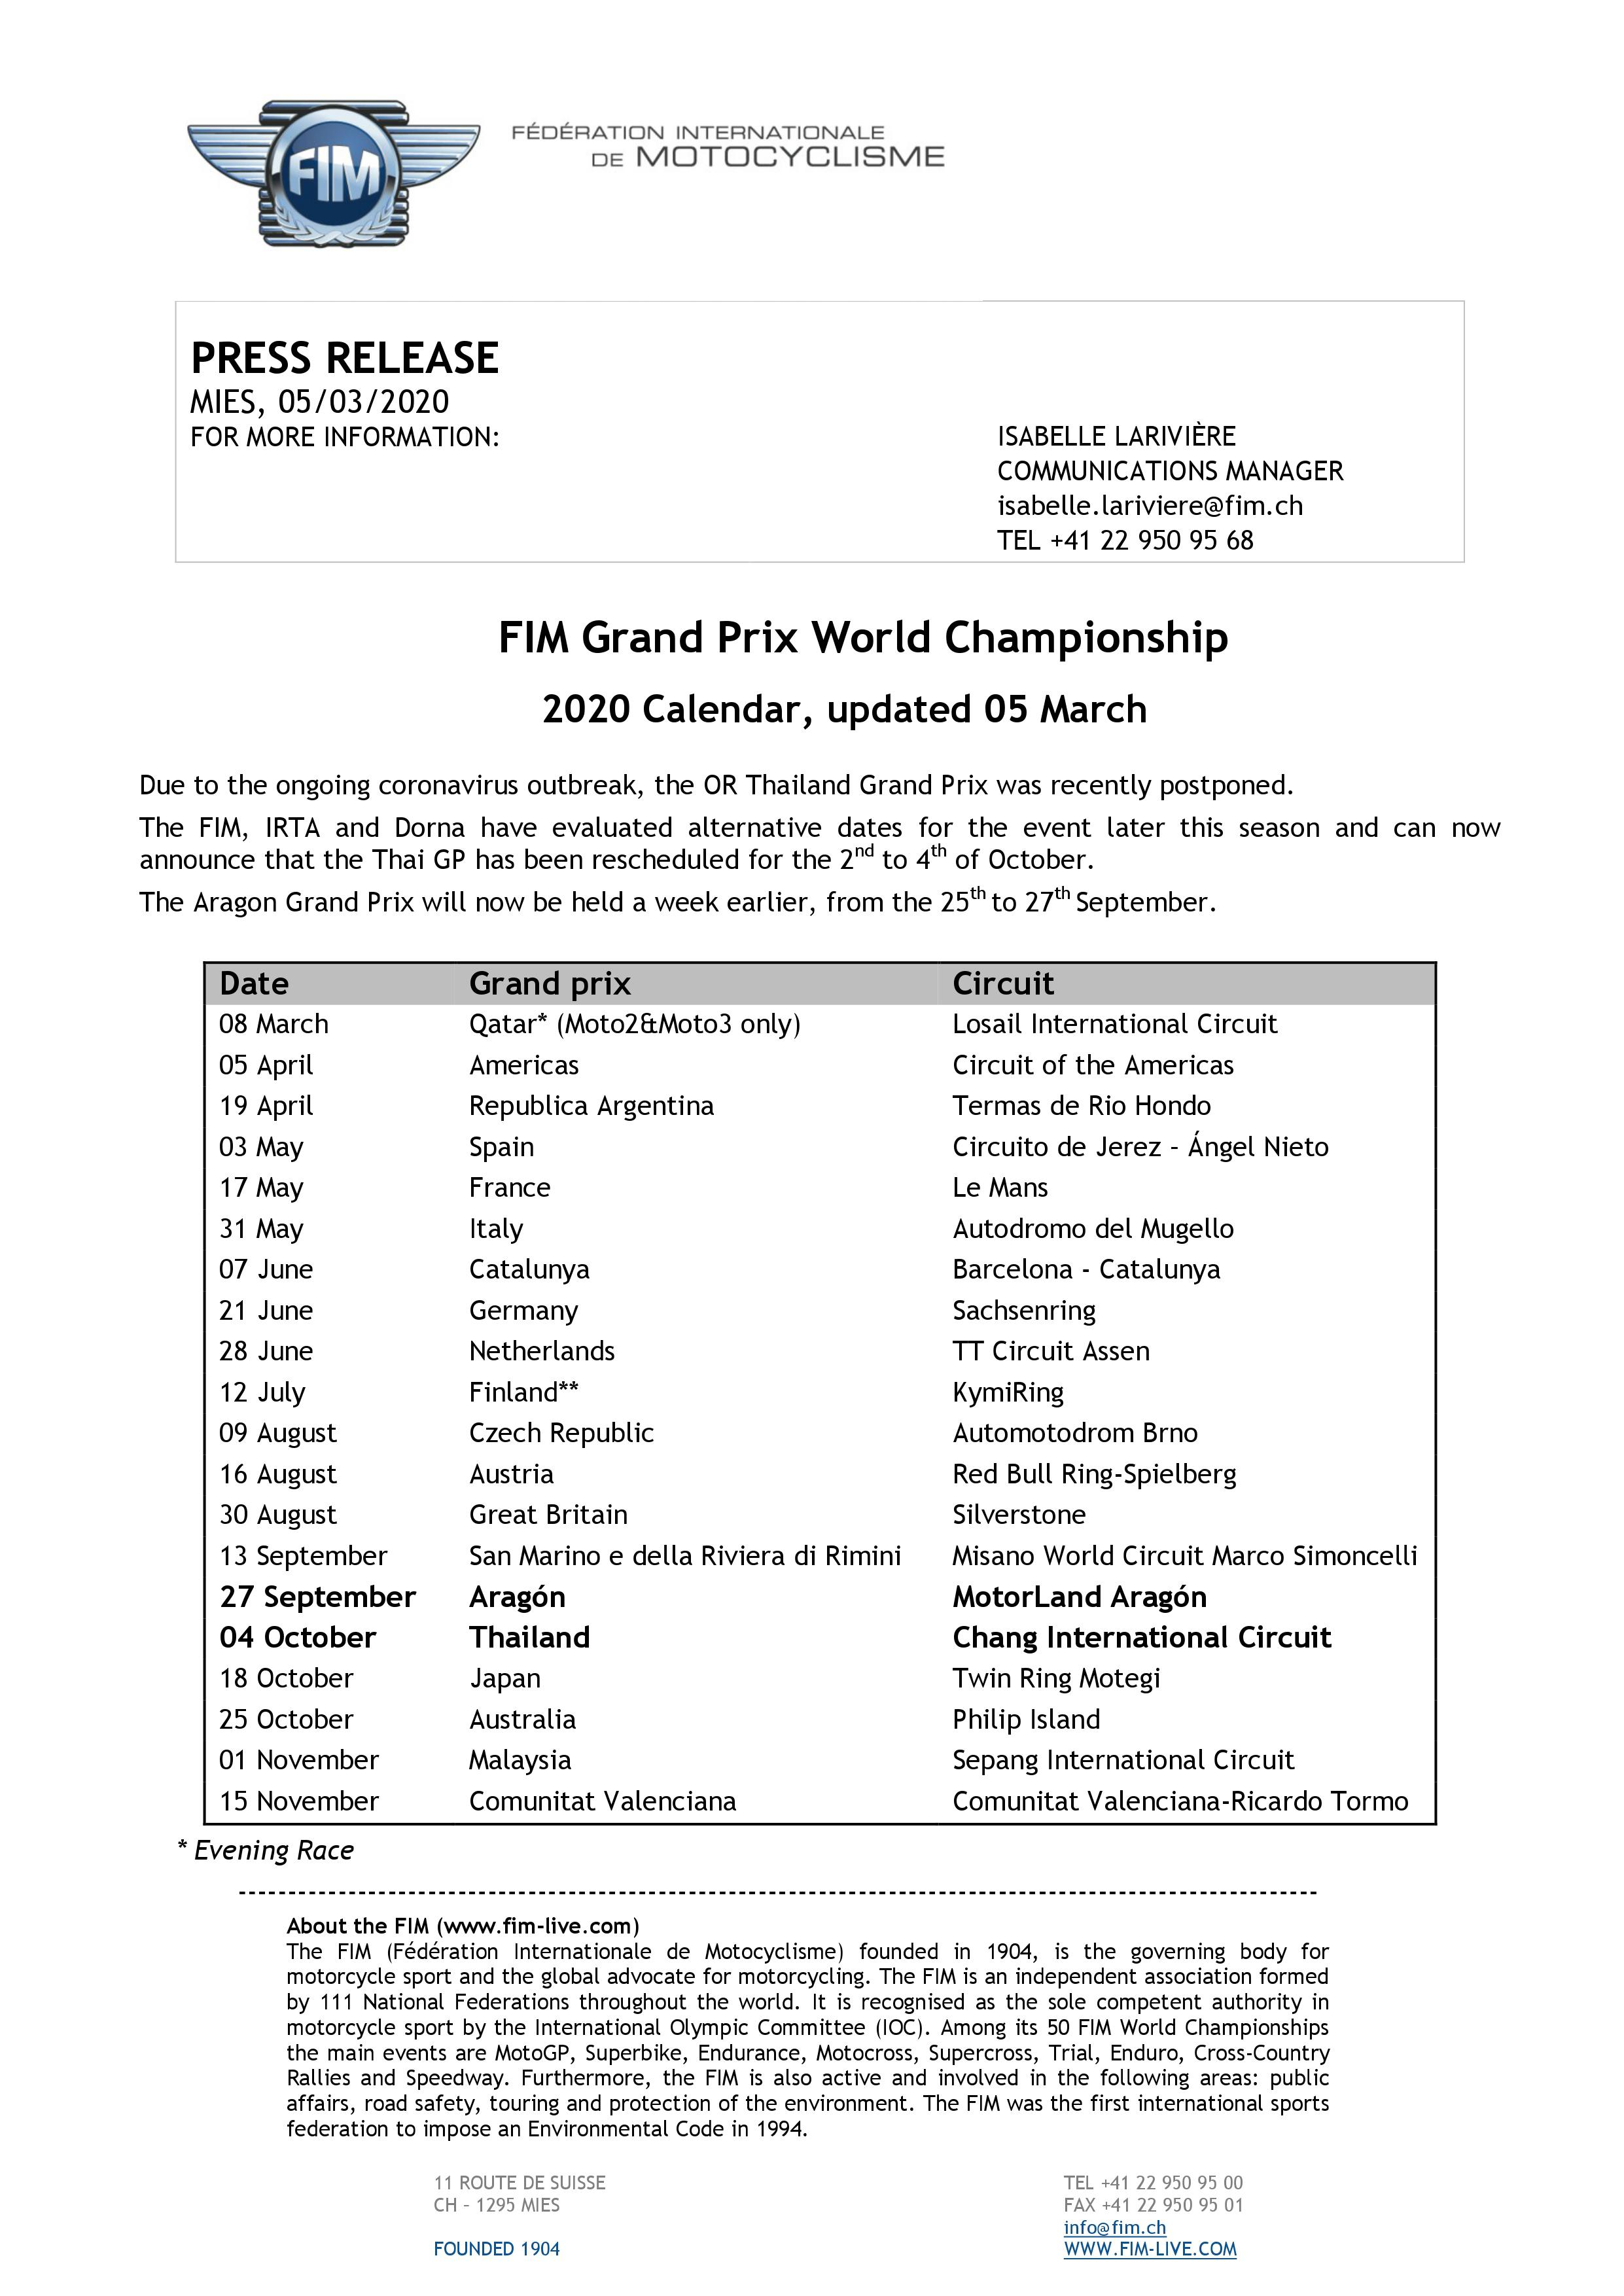 2020 Fim Motogp World Championship Calendar Updated The Garage And Mot Magazine